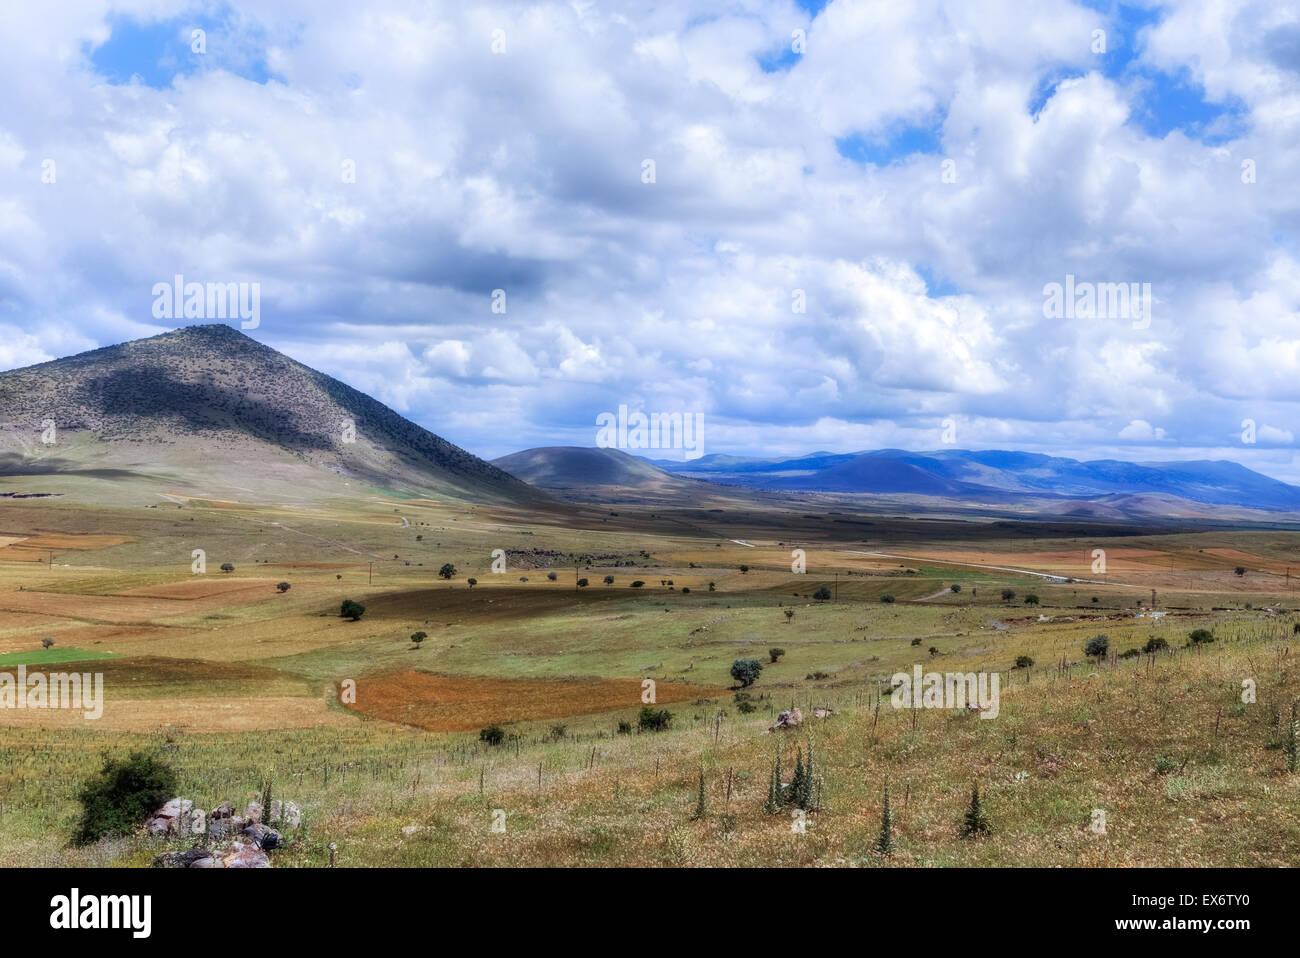 Landschaft mit Vulkanen, Guezelyurt, Aksaray, Anatolien, Türkei Stockbild